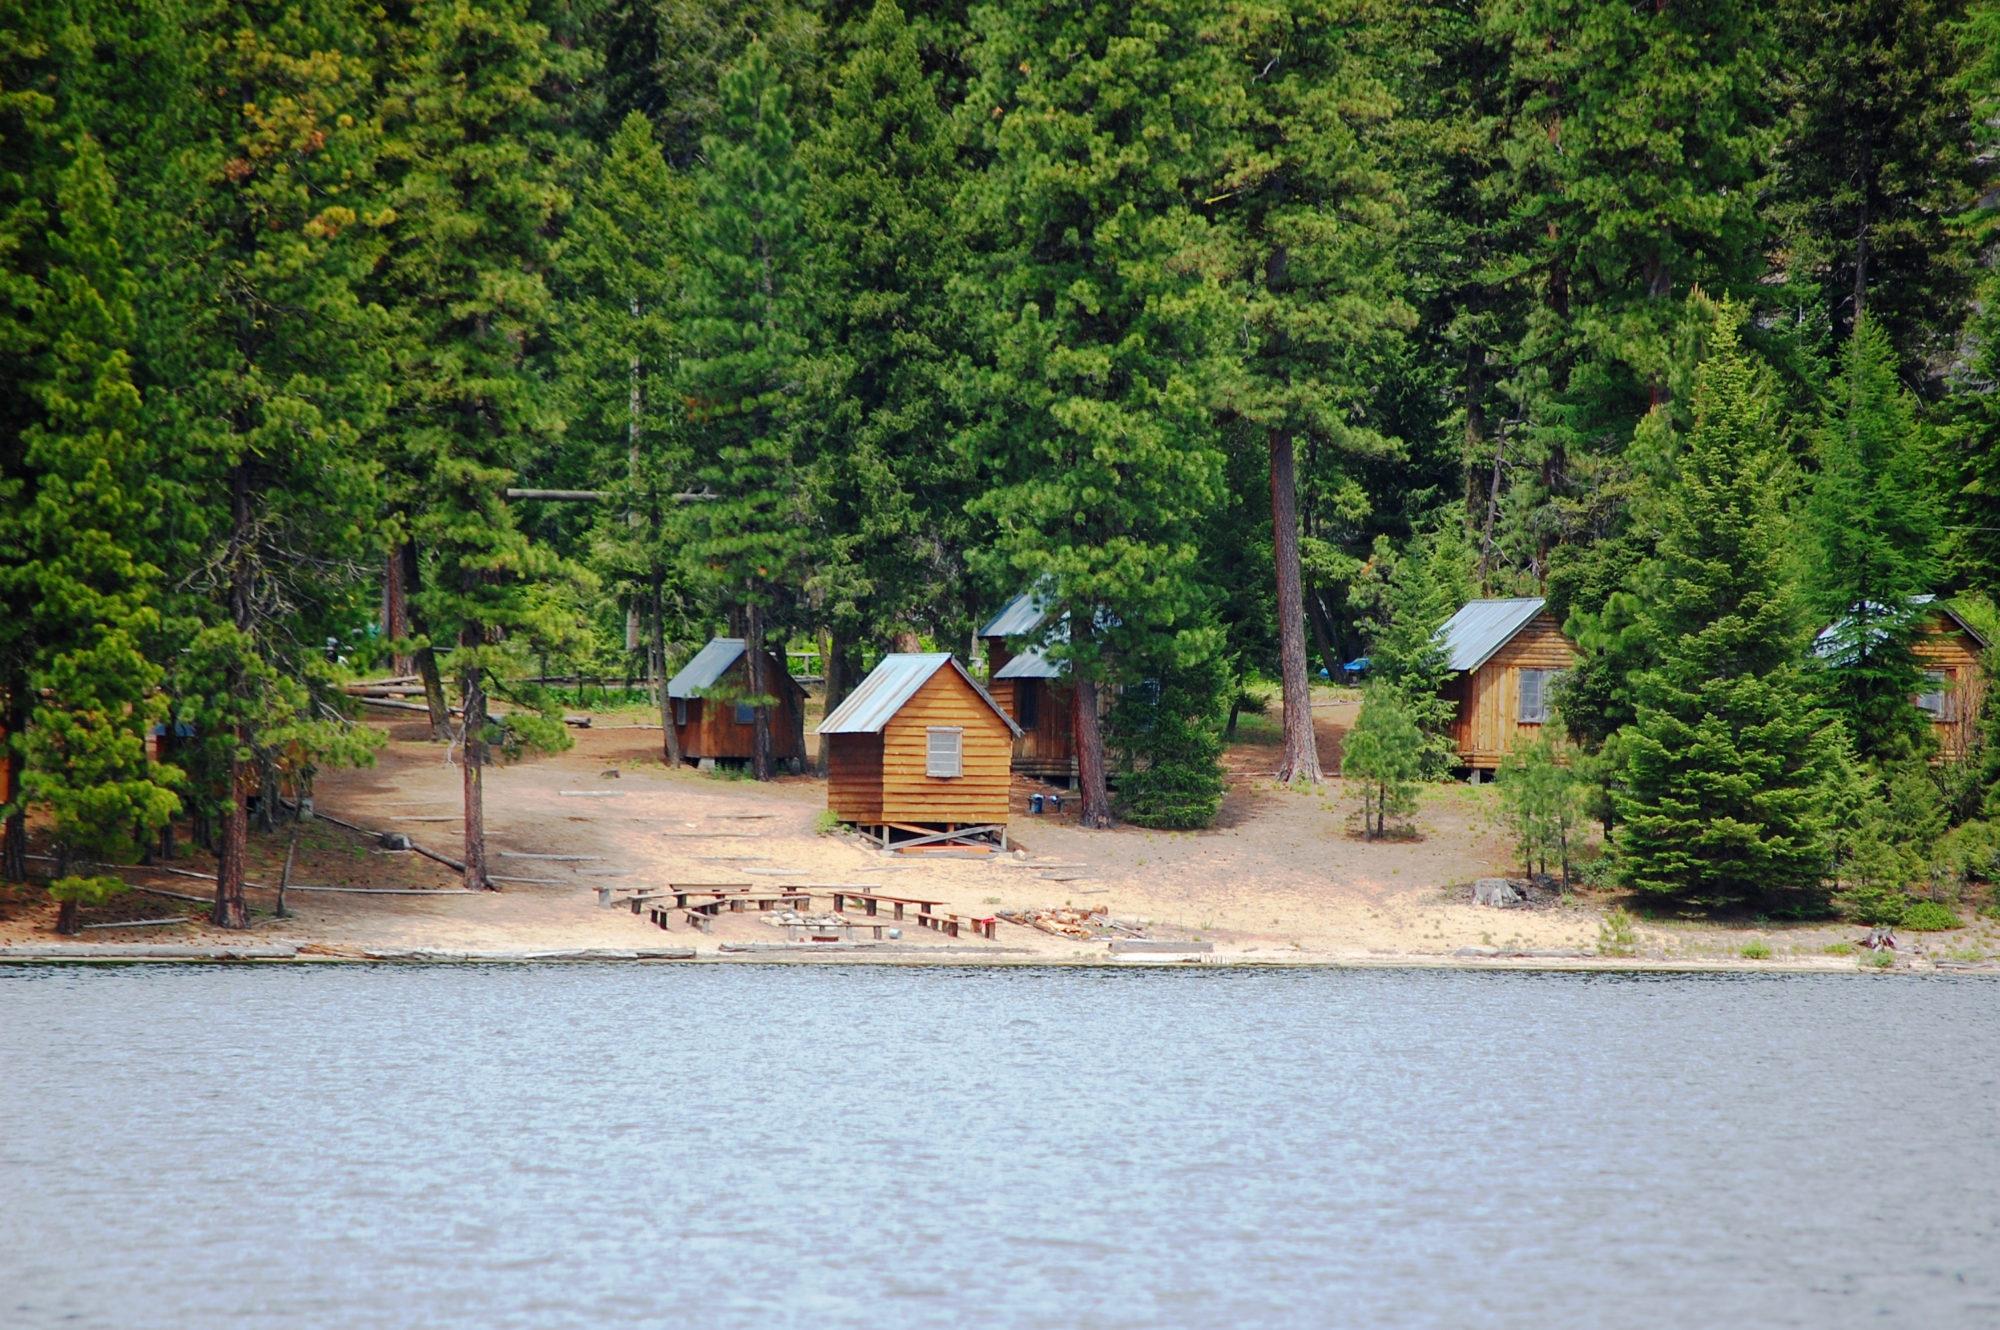 Campground next to lake.